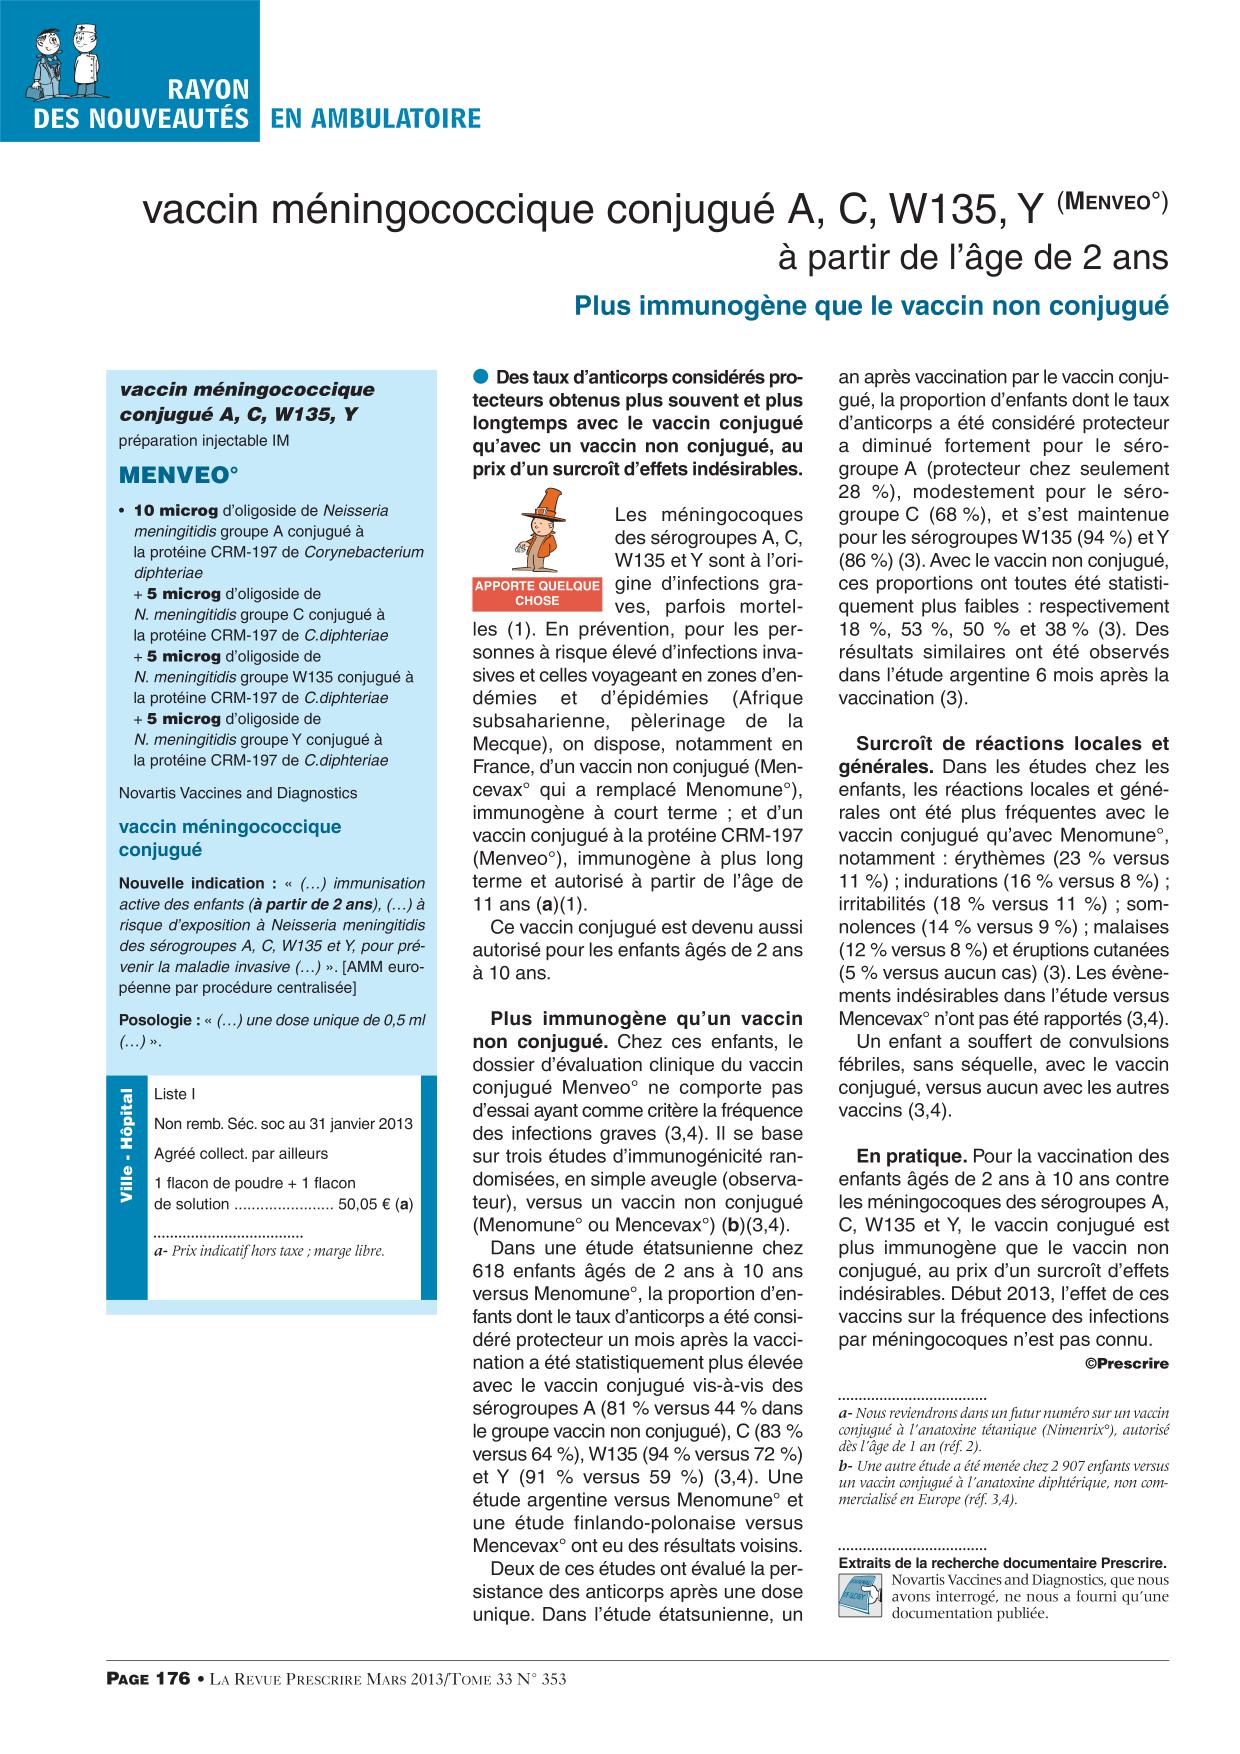 Applidev Prescrire Org Images Data Lrp 353 Standard